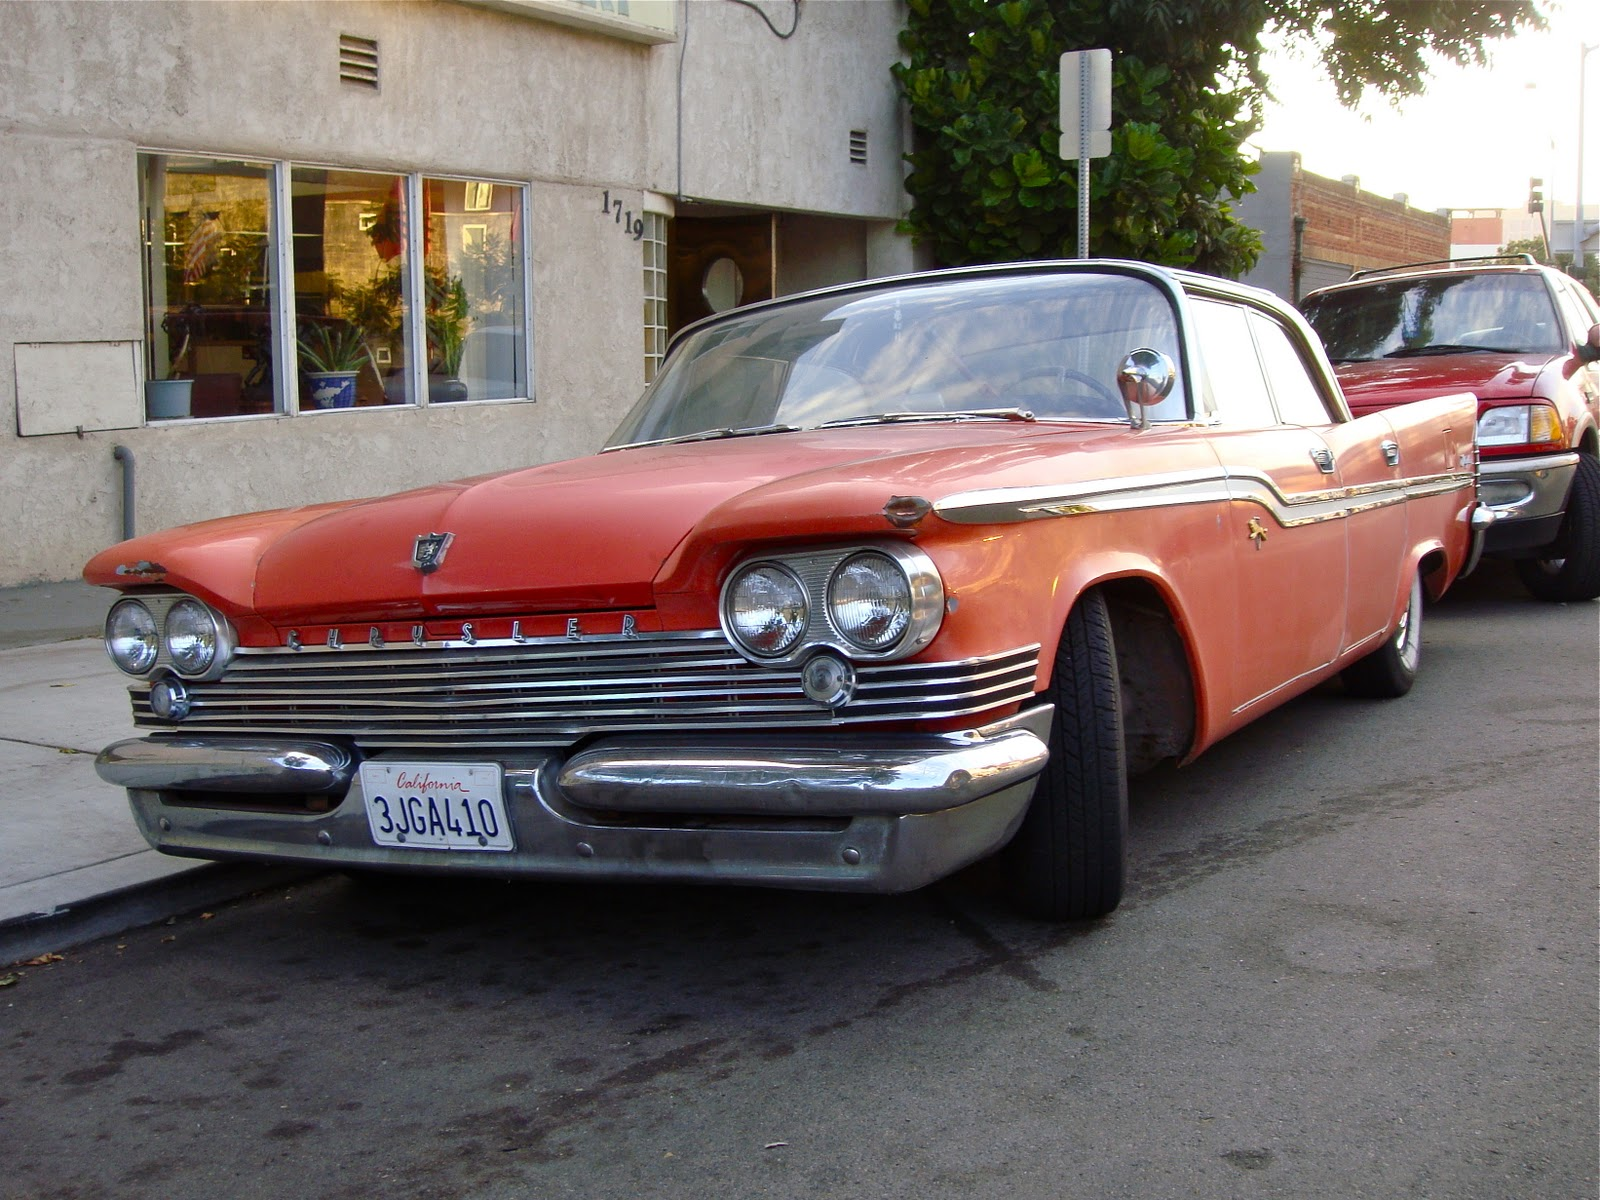 The Street Peep  1959 Chrysler Windsor Sedan